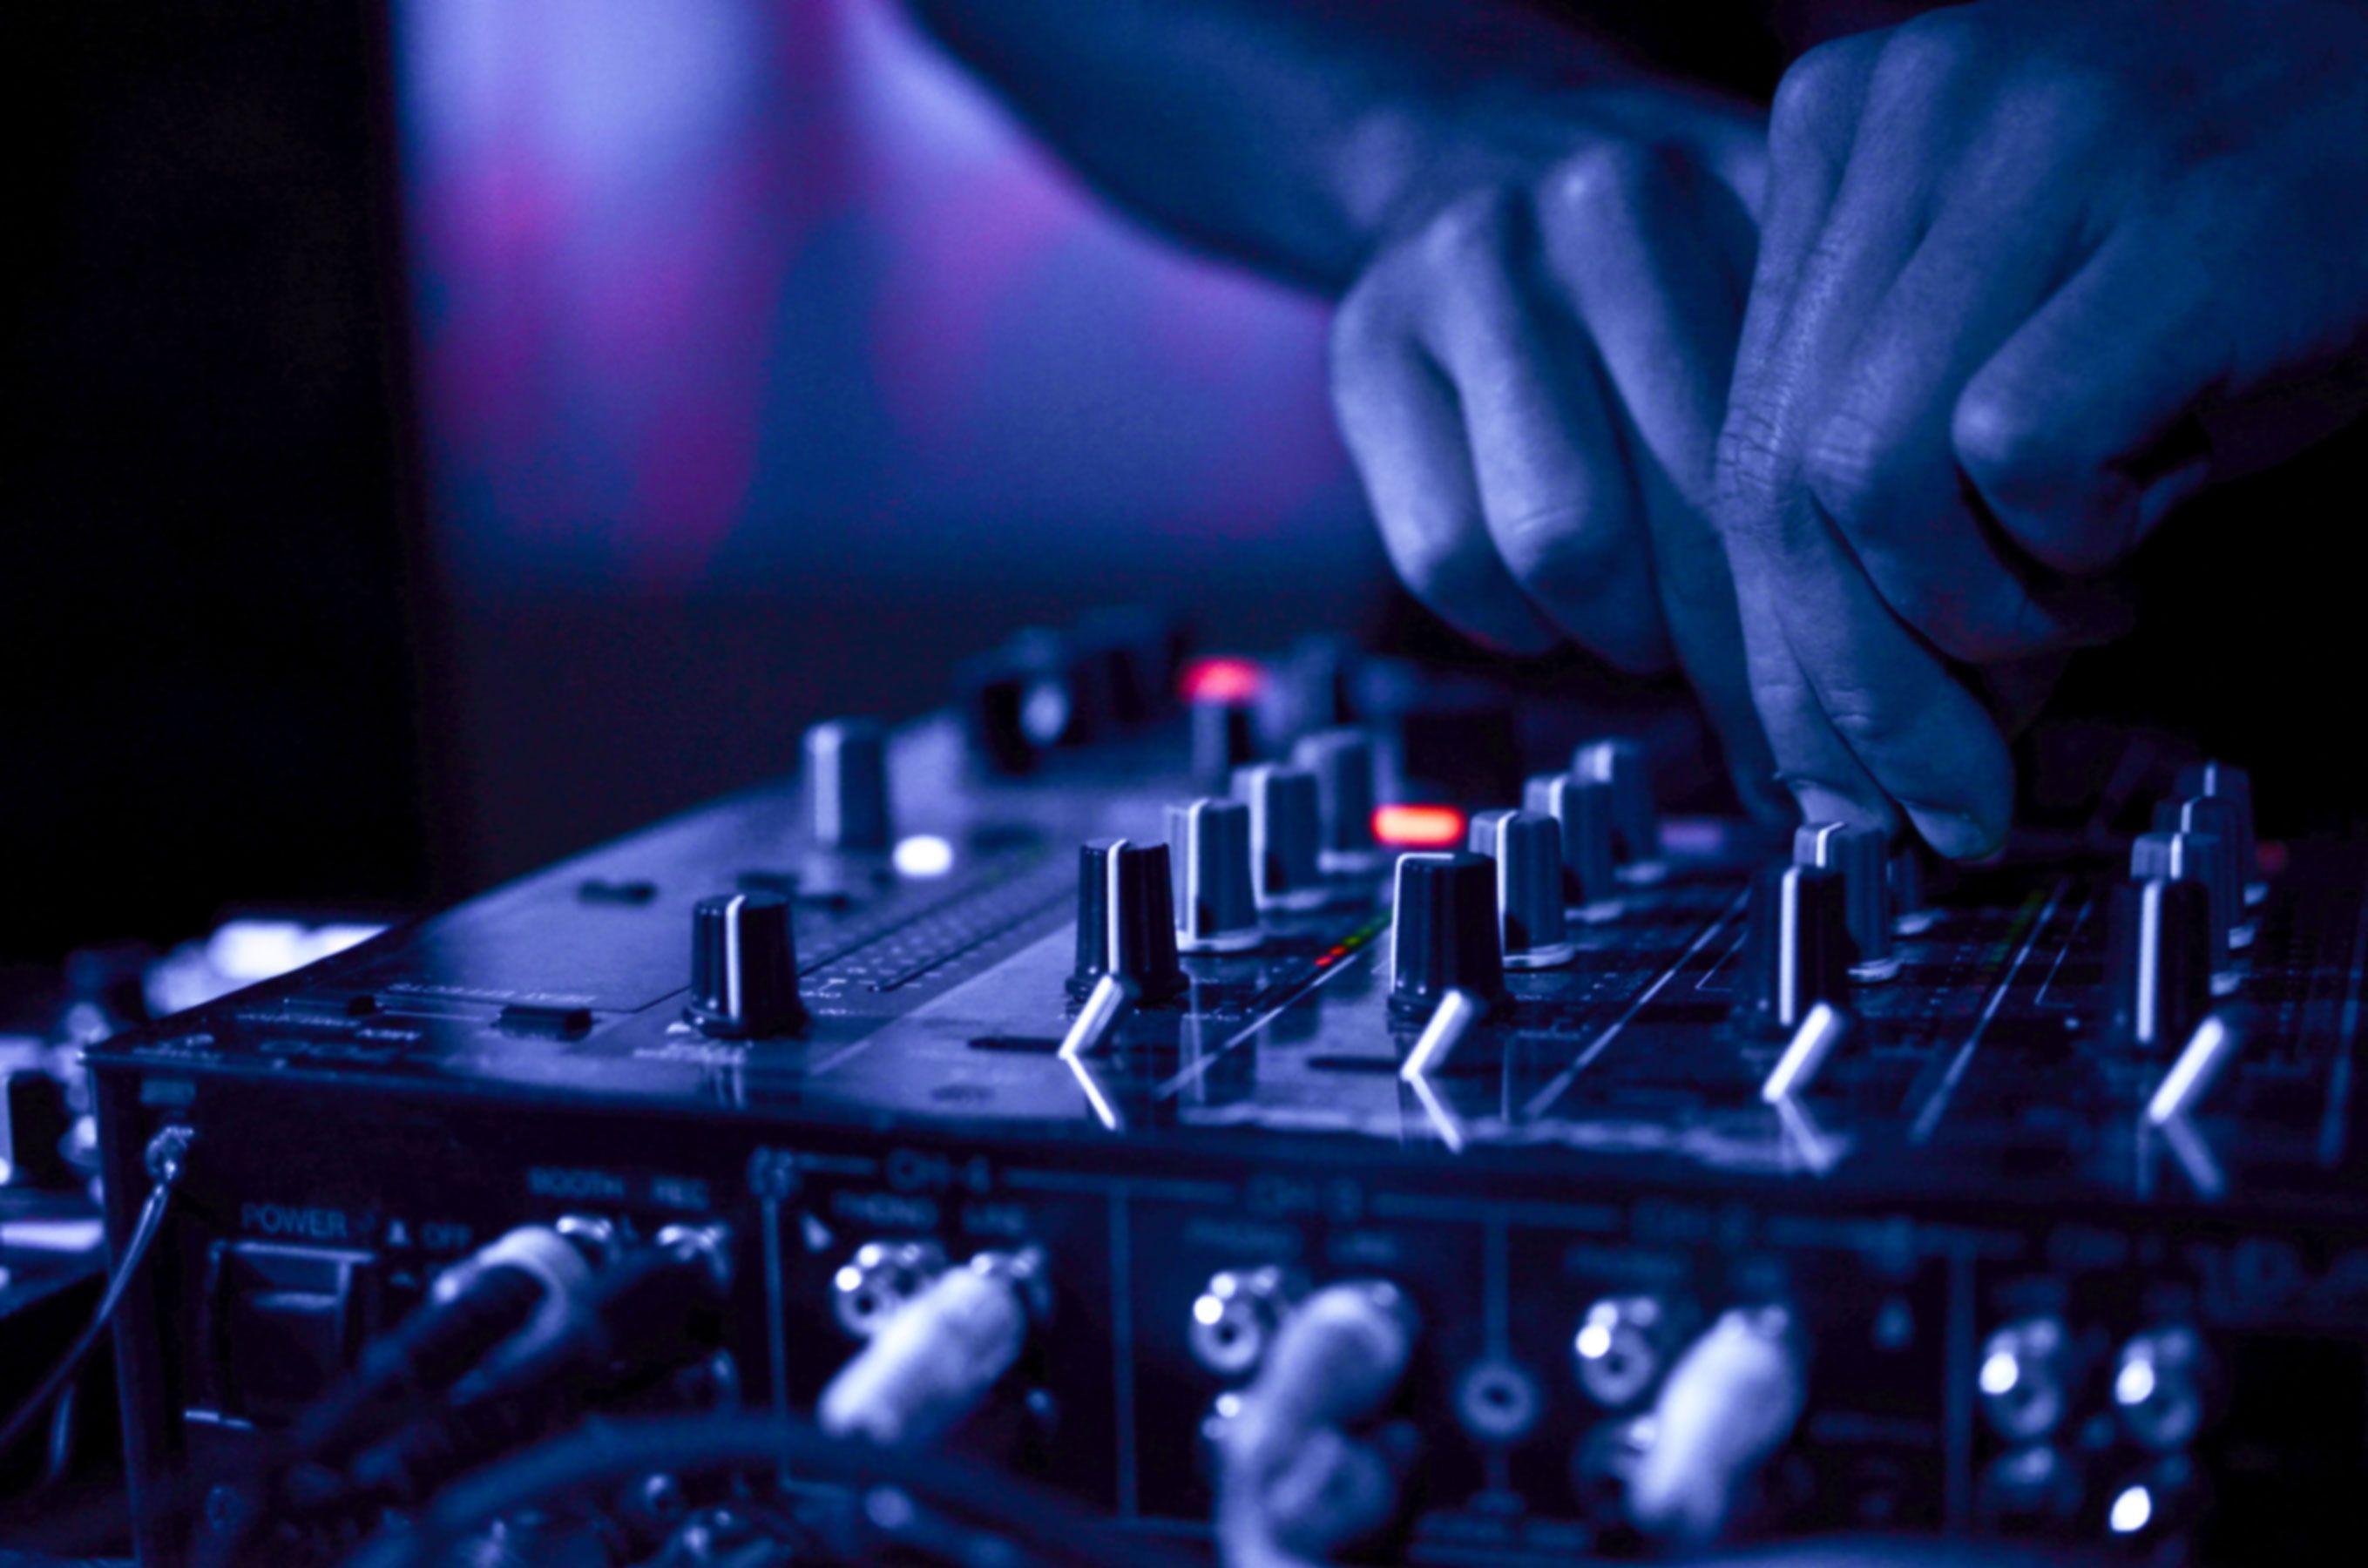 Dj Music Dj Music Dj Electronic Music